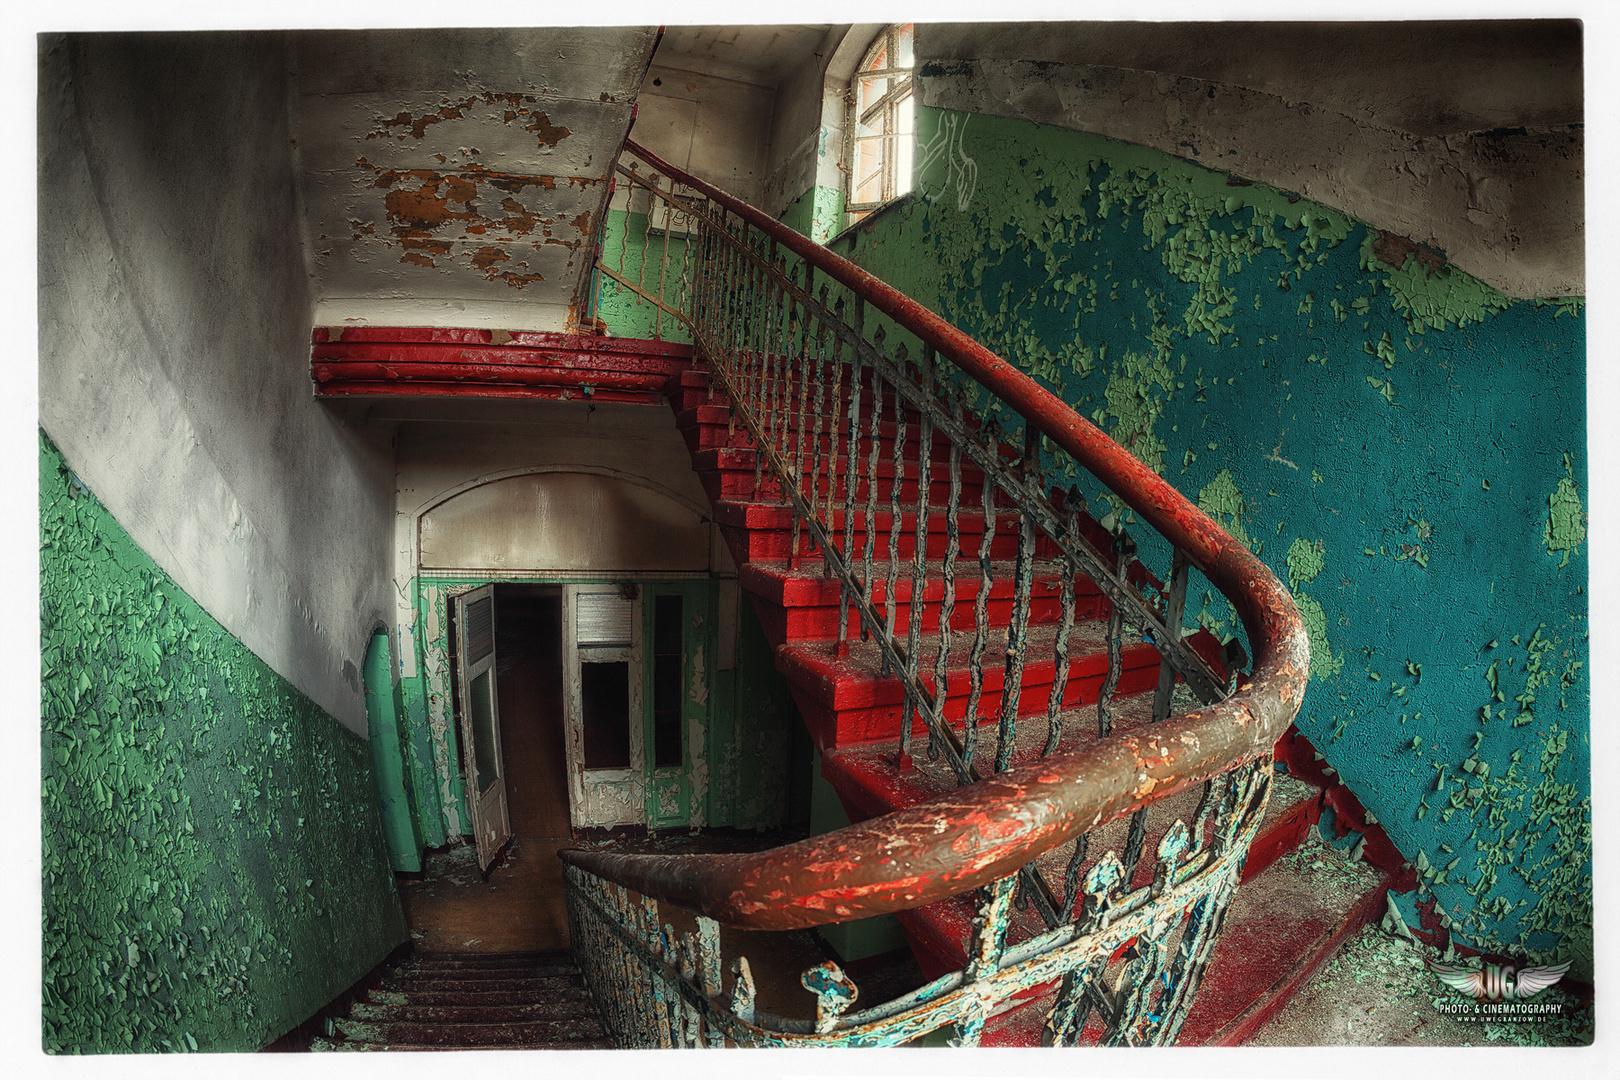 Treppenhaus in Beelitz Heilstätten